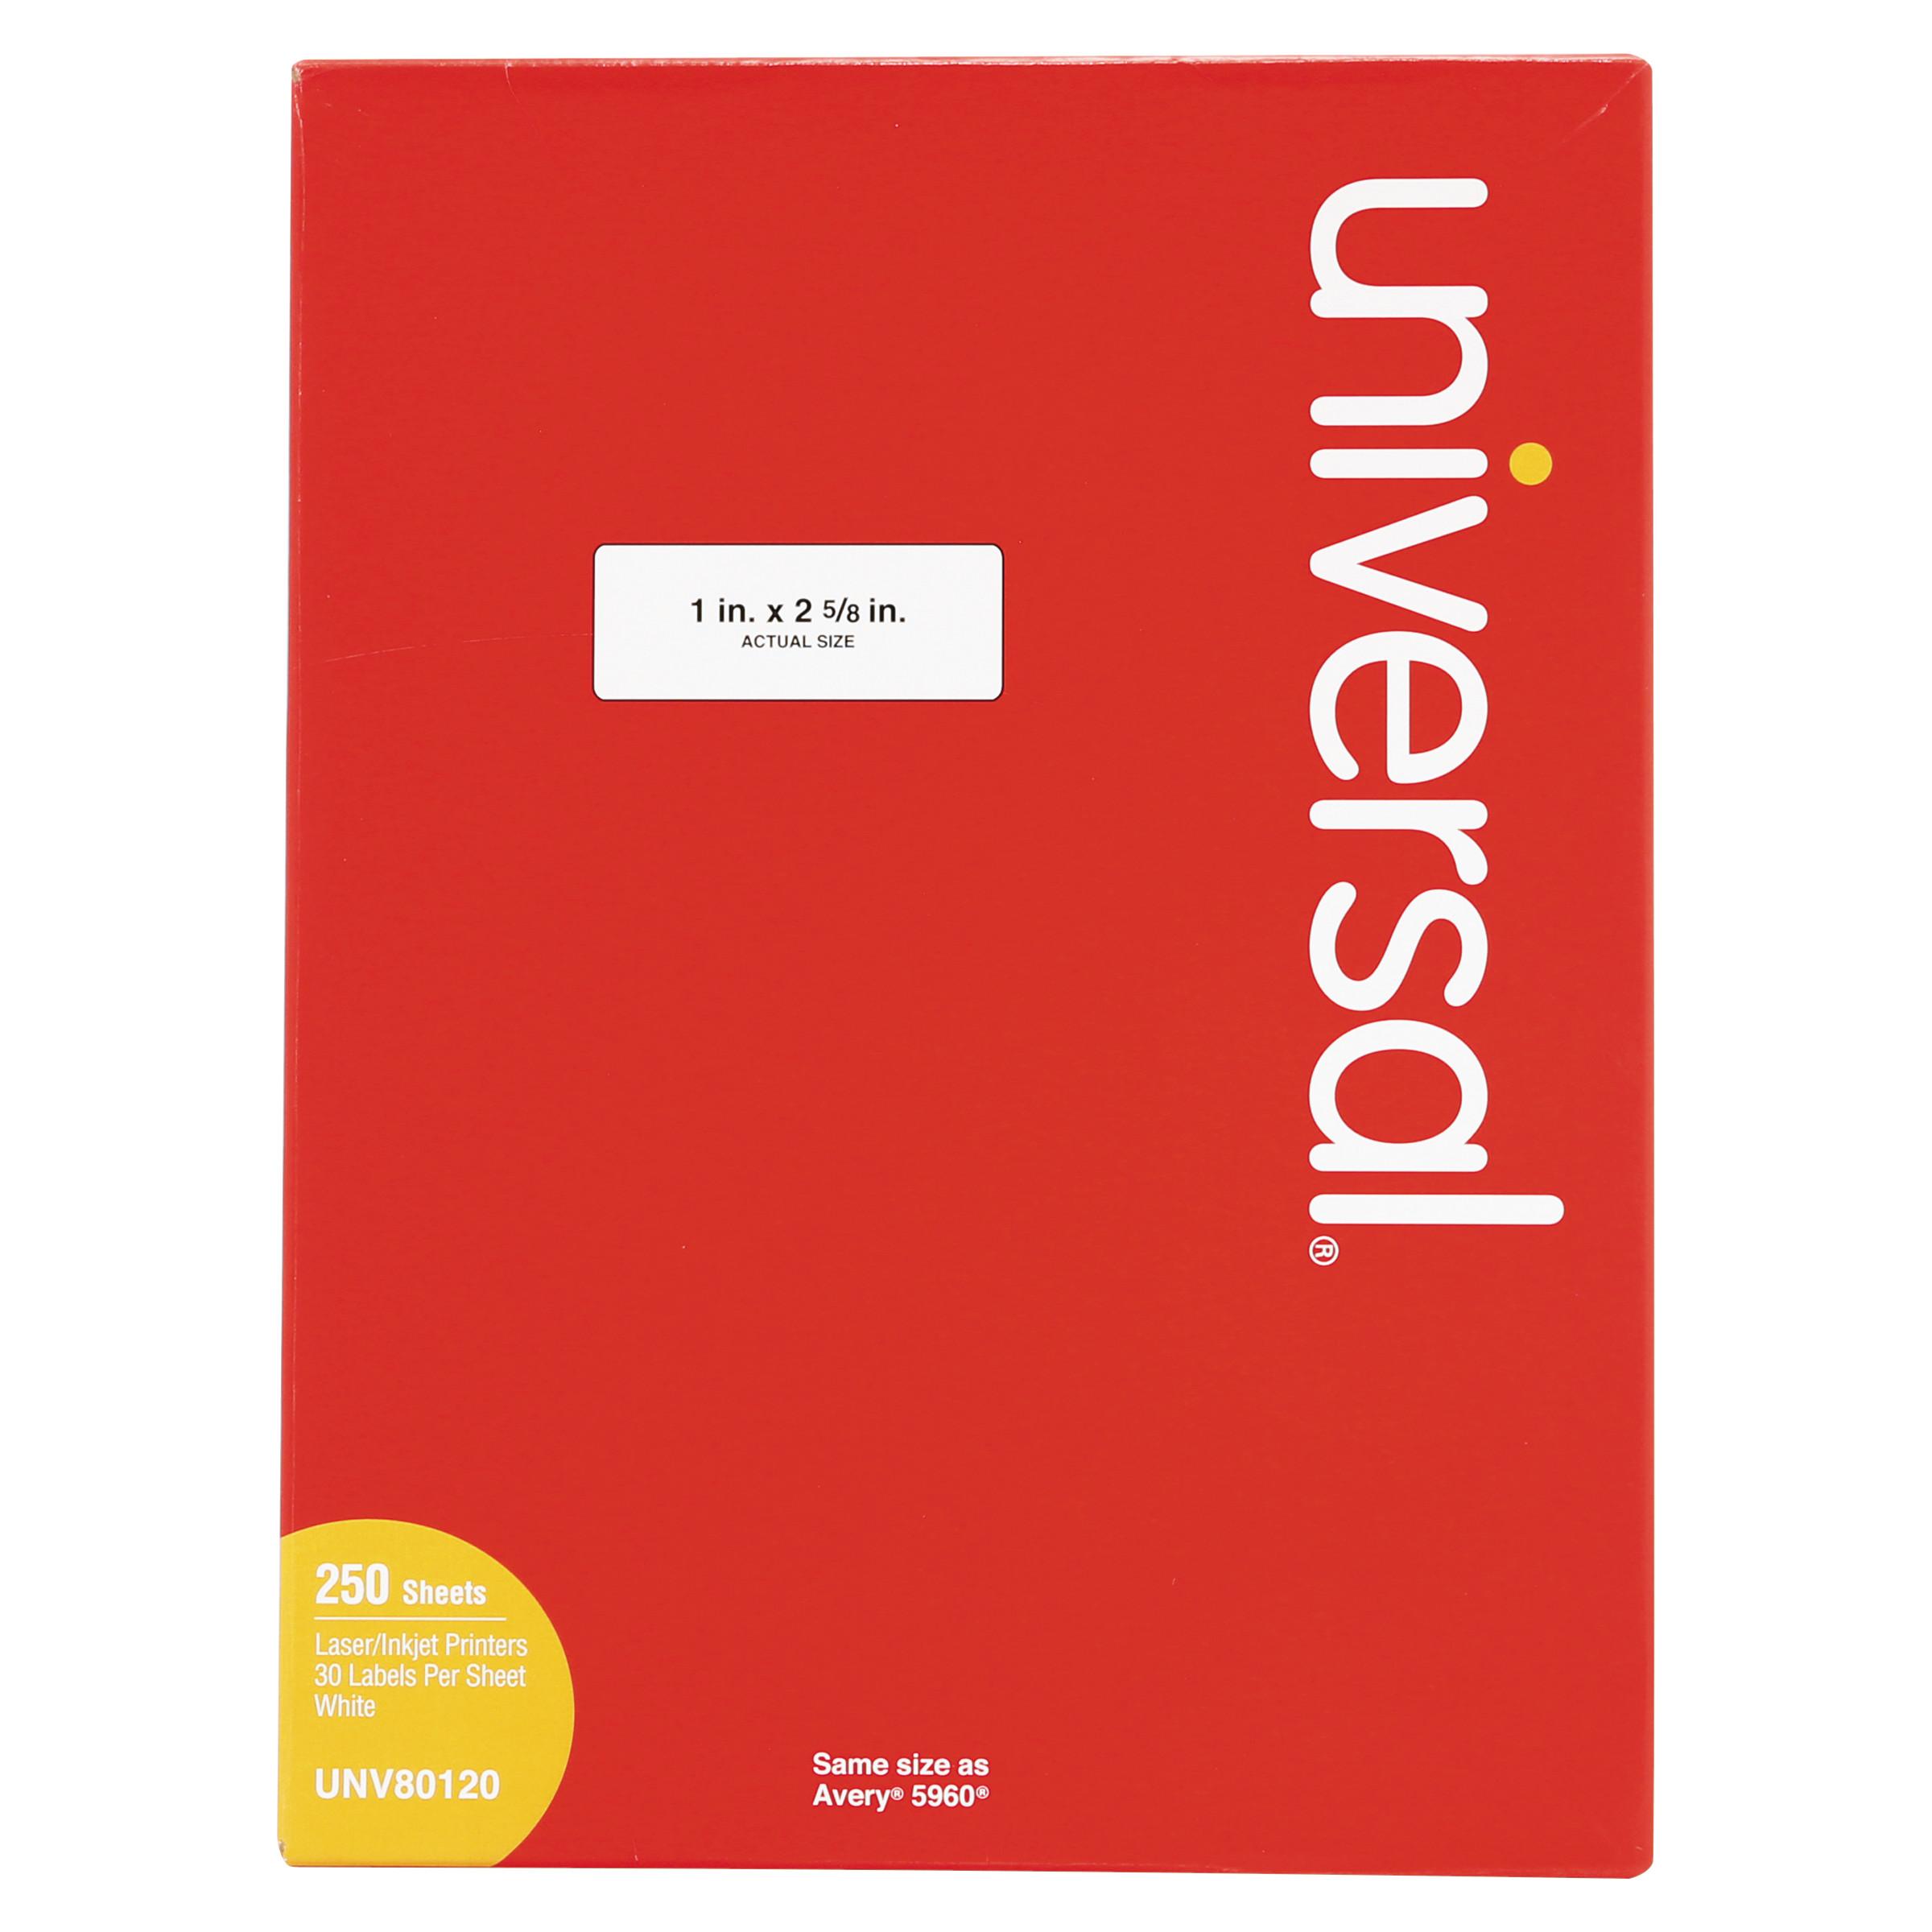 Universal Laser Printer Permanent Labels, 1 x 2 5/8, White, 7500/Box -UNV80120